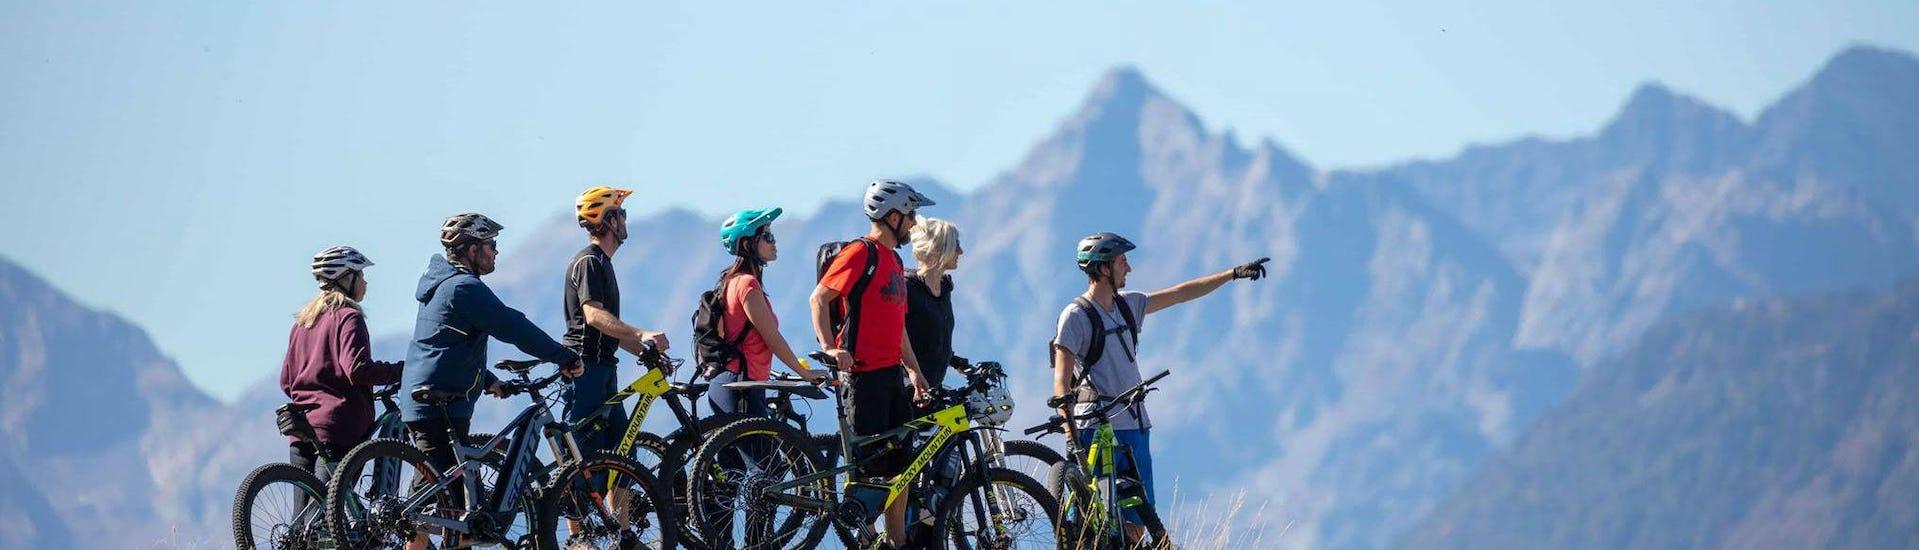 Mountain Bike Training - Advanced & Expert